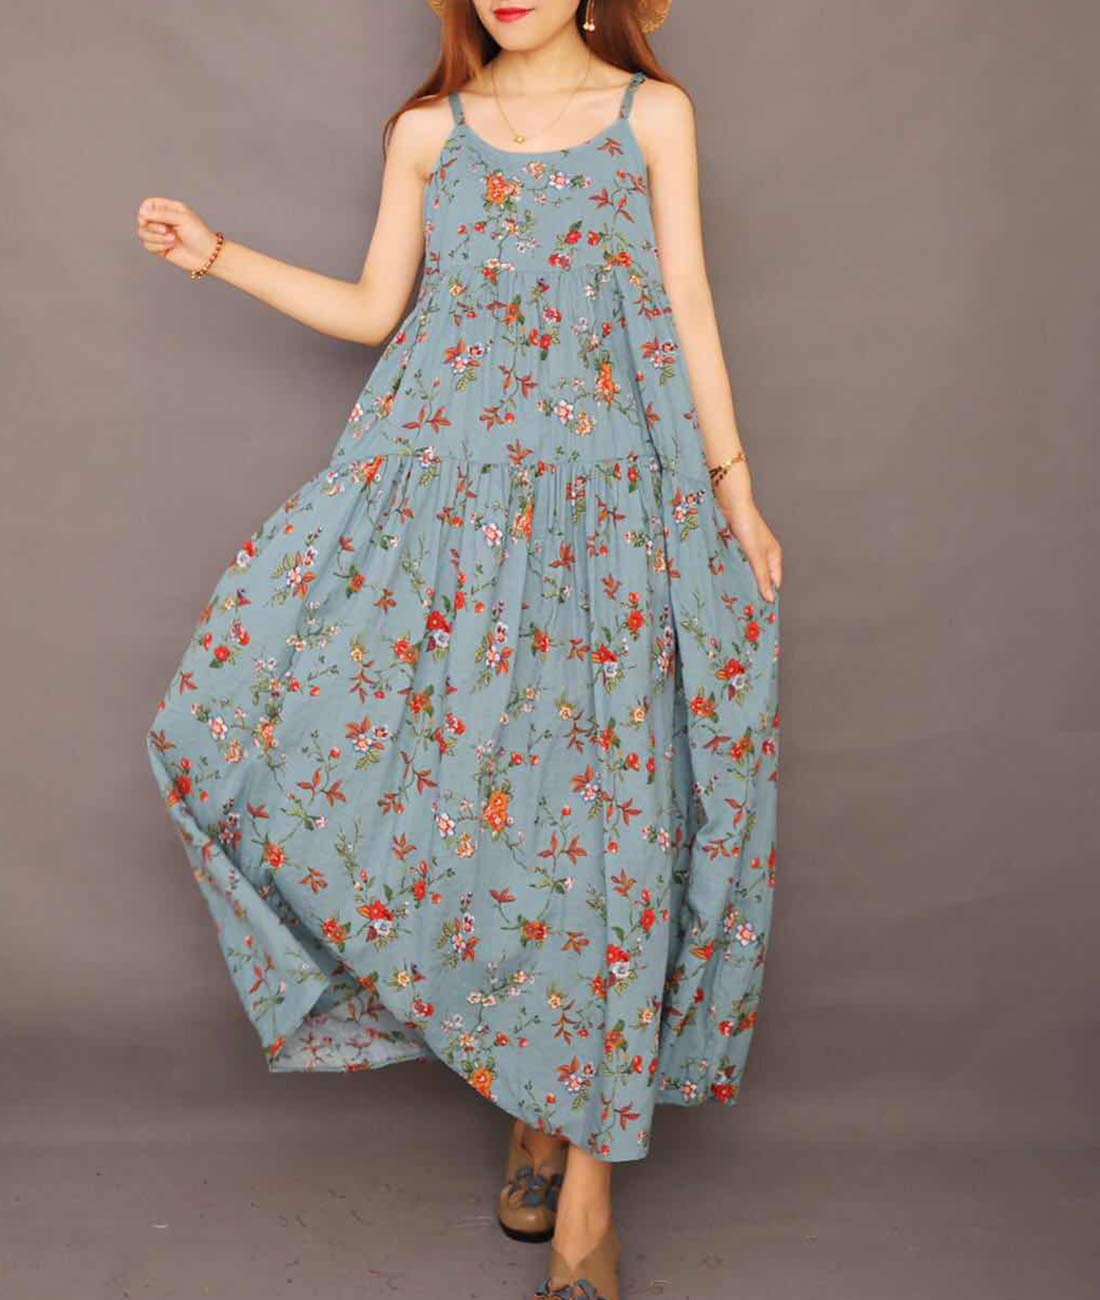 YESNO Women Casual Loose Bohemian Floral Print Dresses Spaghetti Strap Long Maxi Summer Beach Swing Dress XS-5X E75